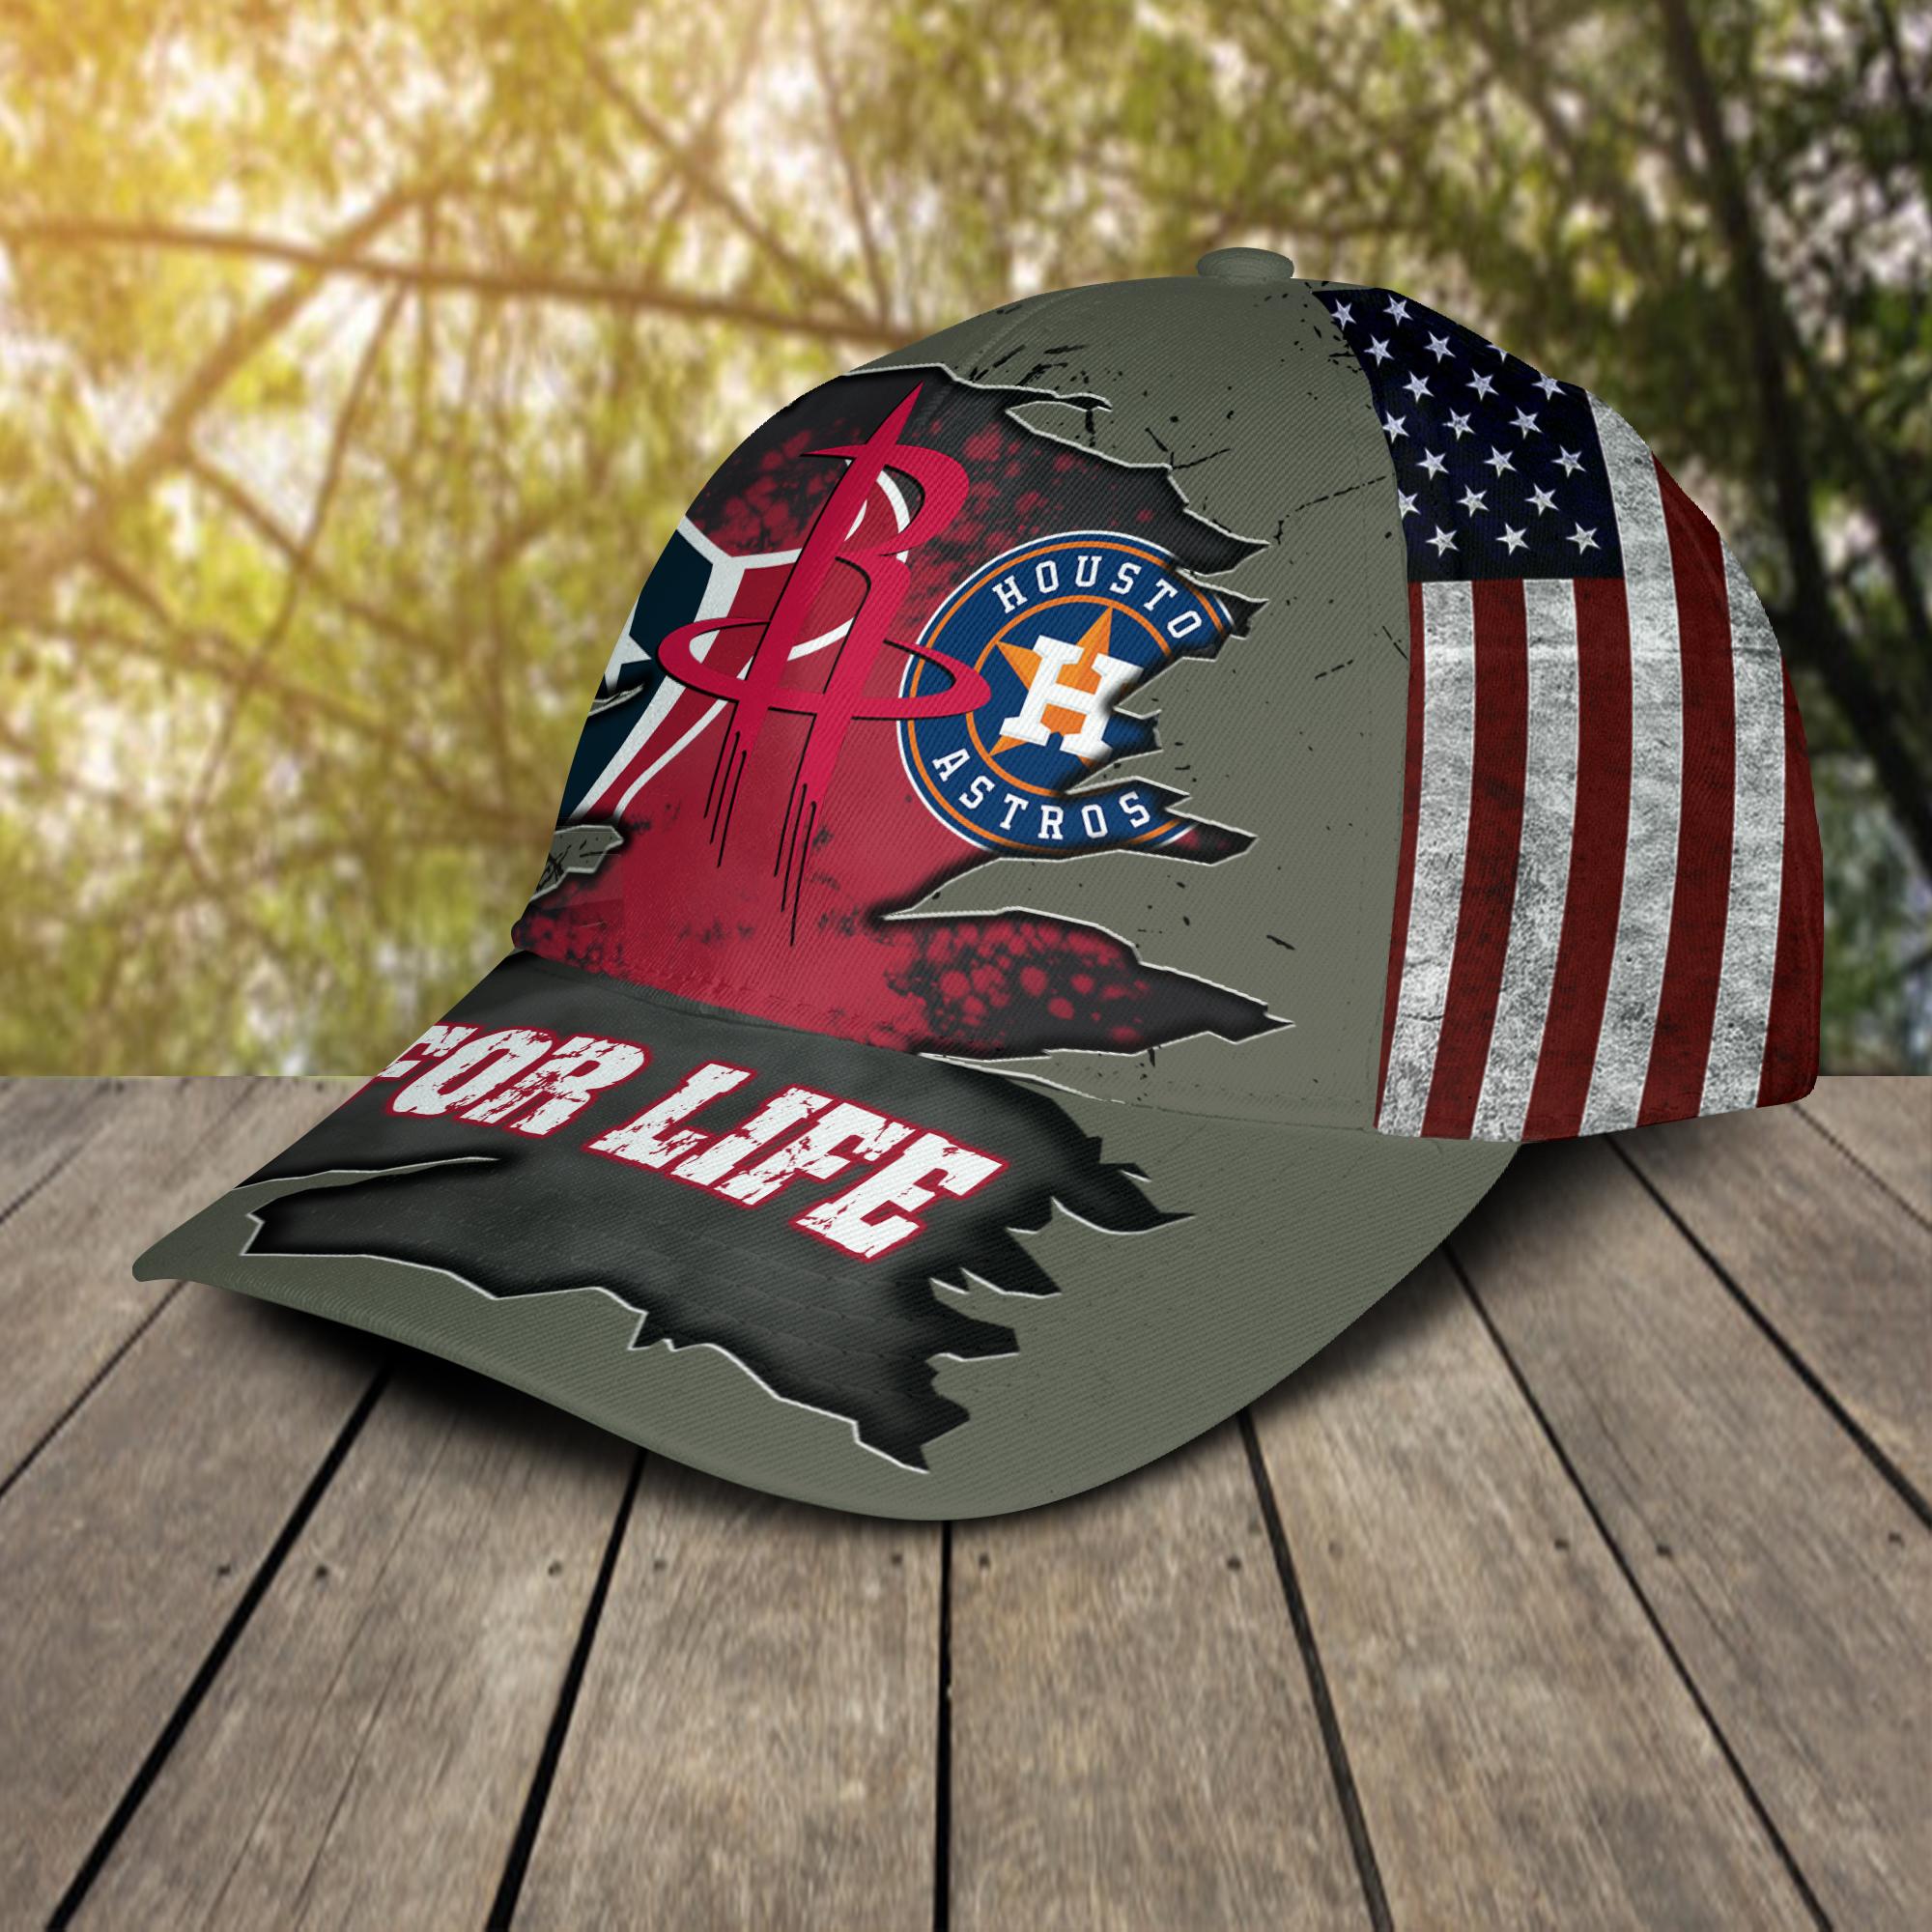 Houston Texans, Houston Astros, Houston Rockets For Life Hat Cap